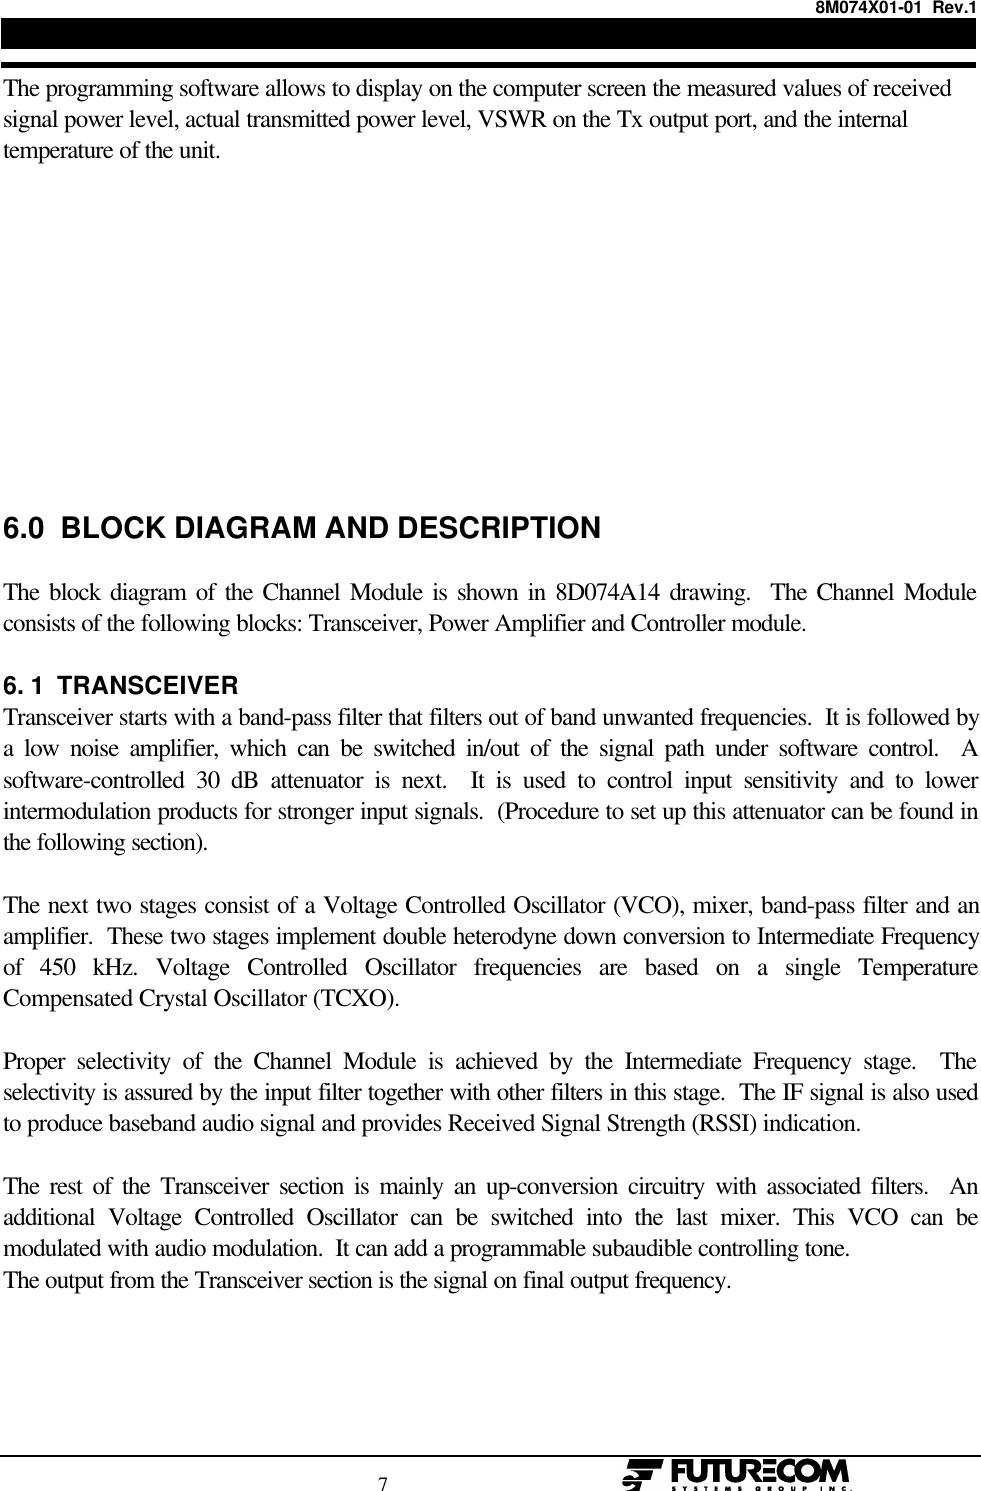 Futurecom Systems Group ULC CMDUHF CMD UHF User Manual 8M074X01